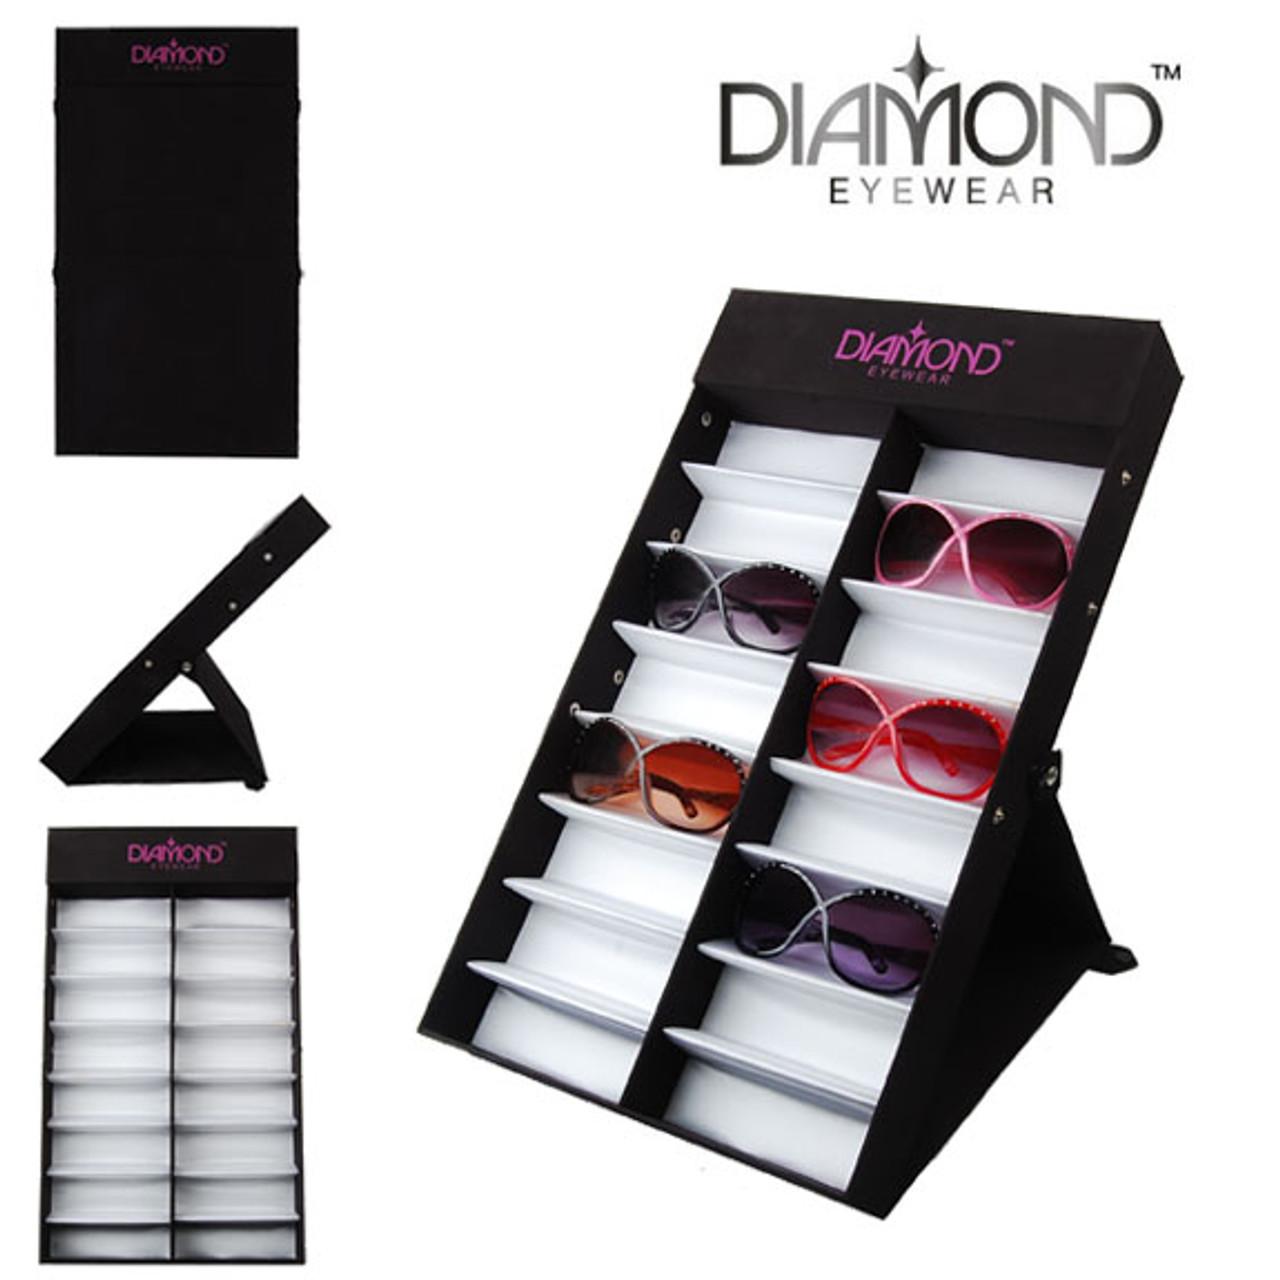 Diamond Eyewear Travel Display for Sunglasses 7065